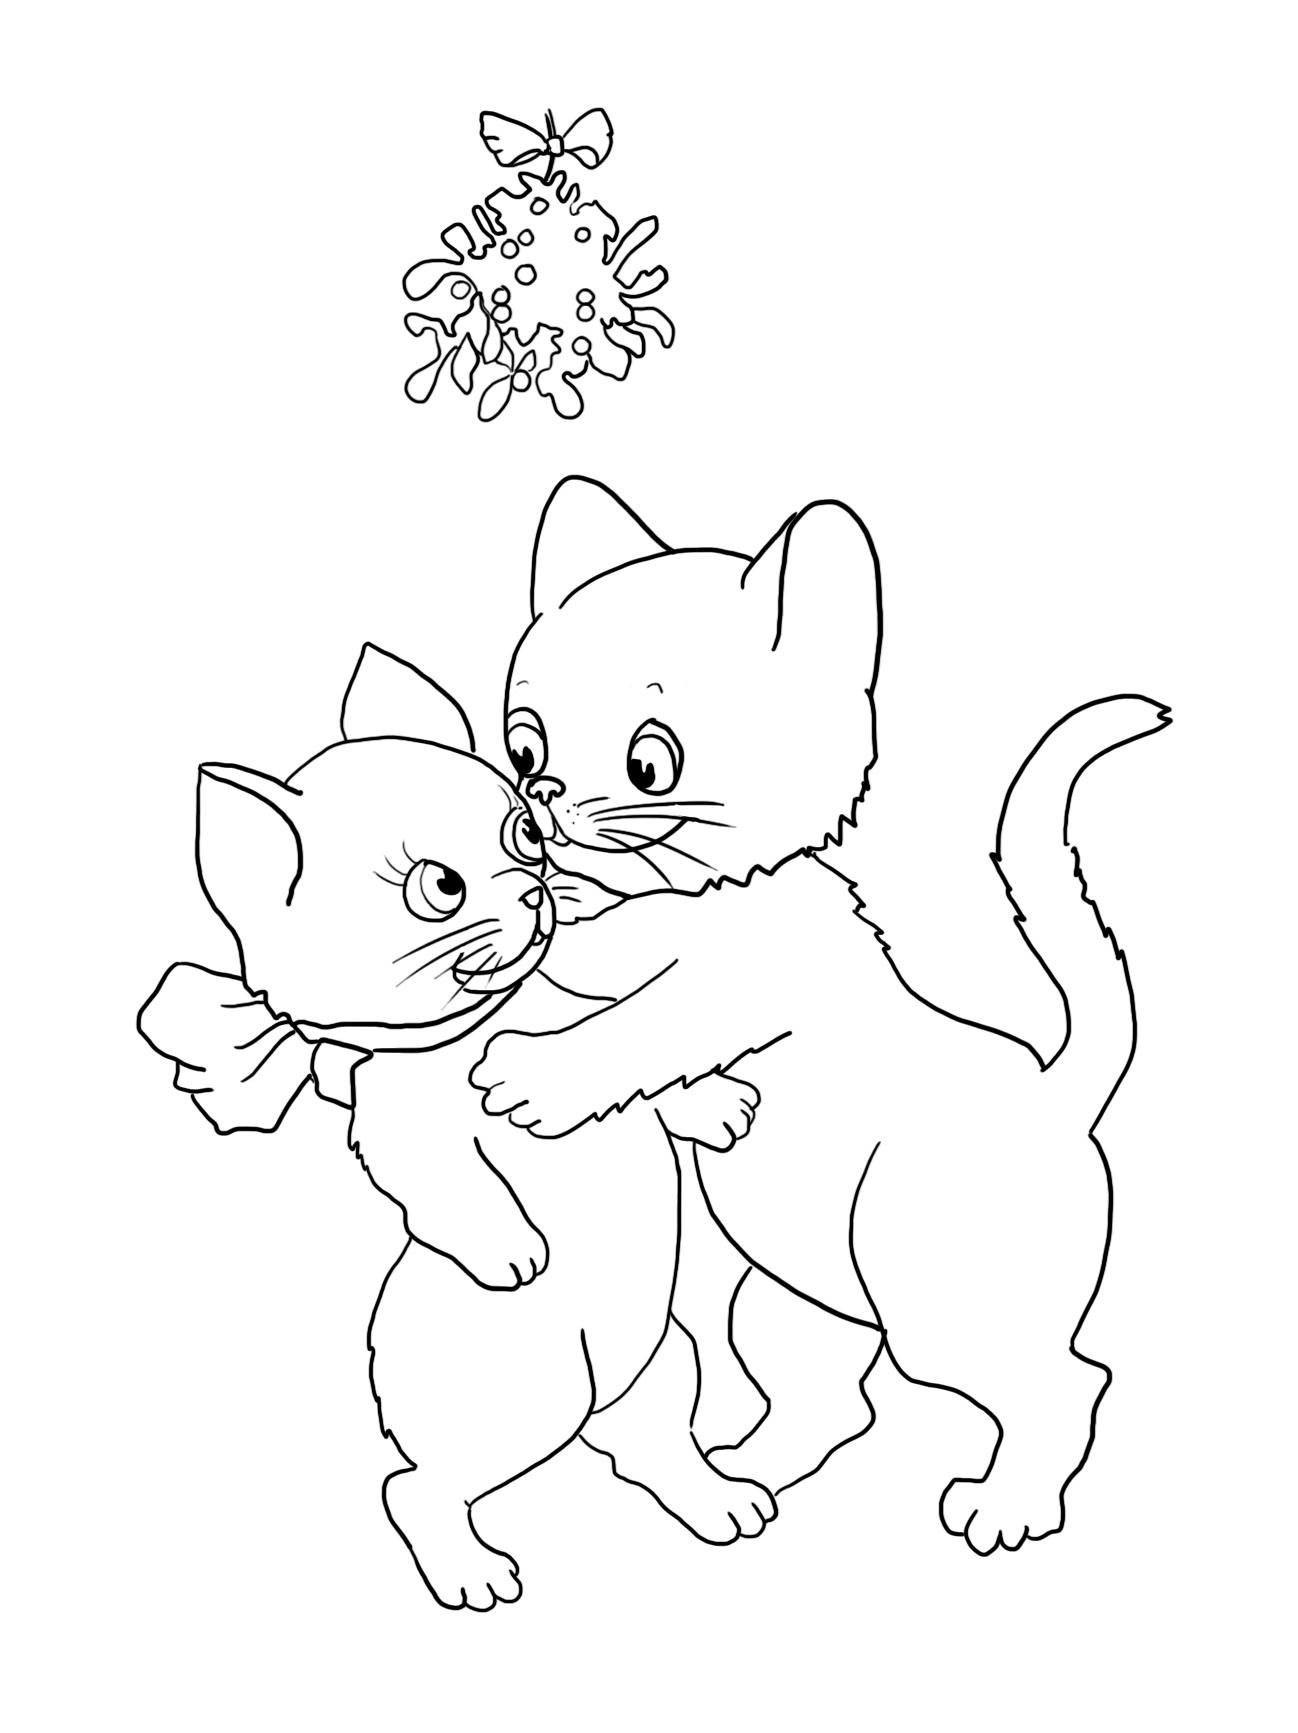 two cats kissing under mistletoe